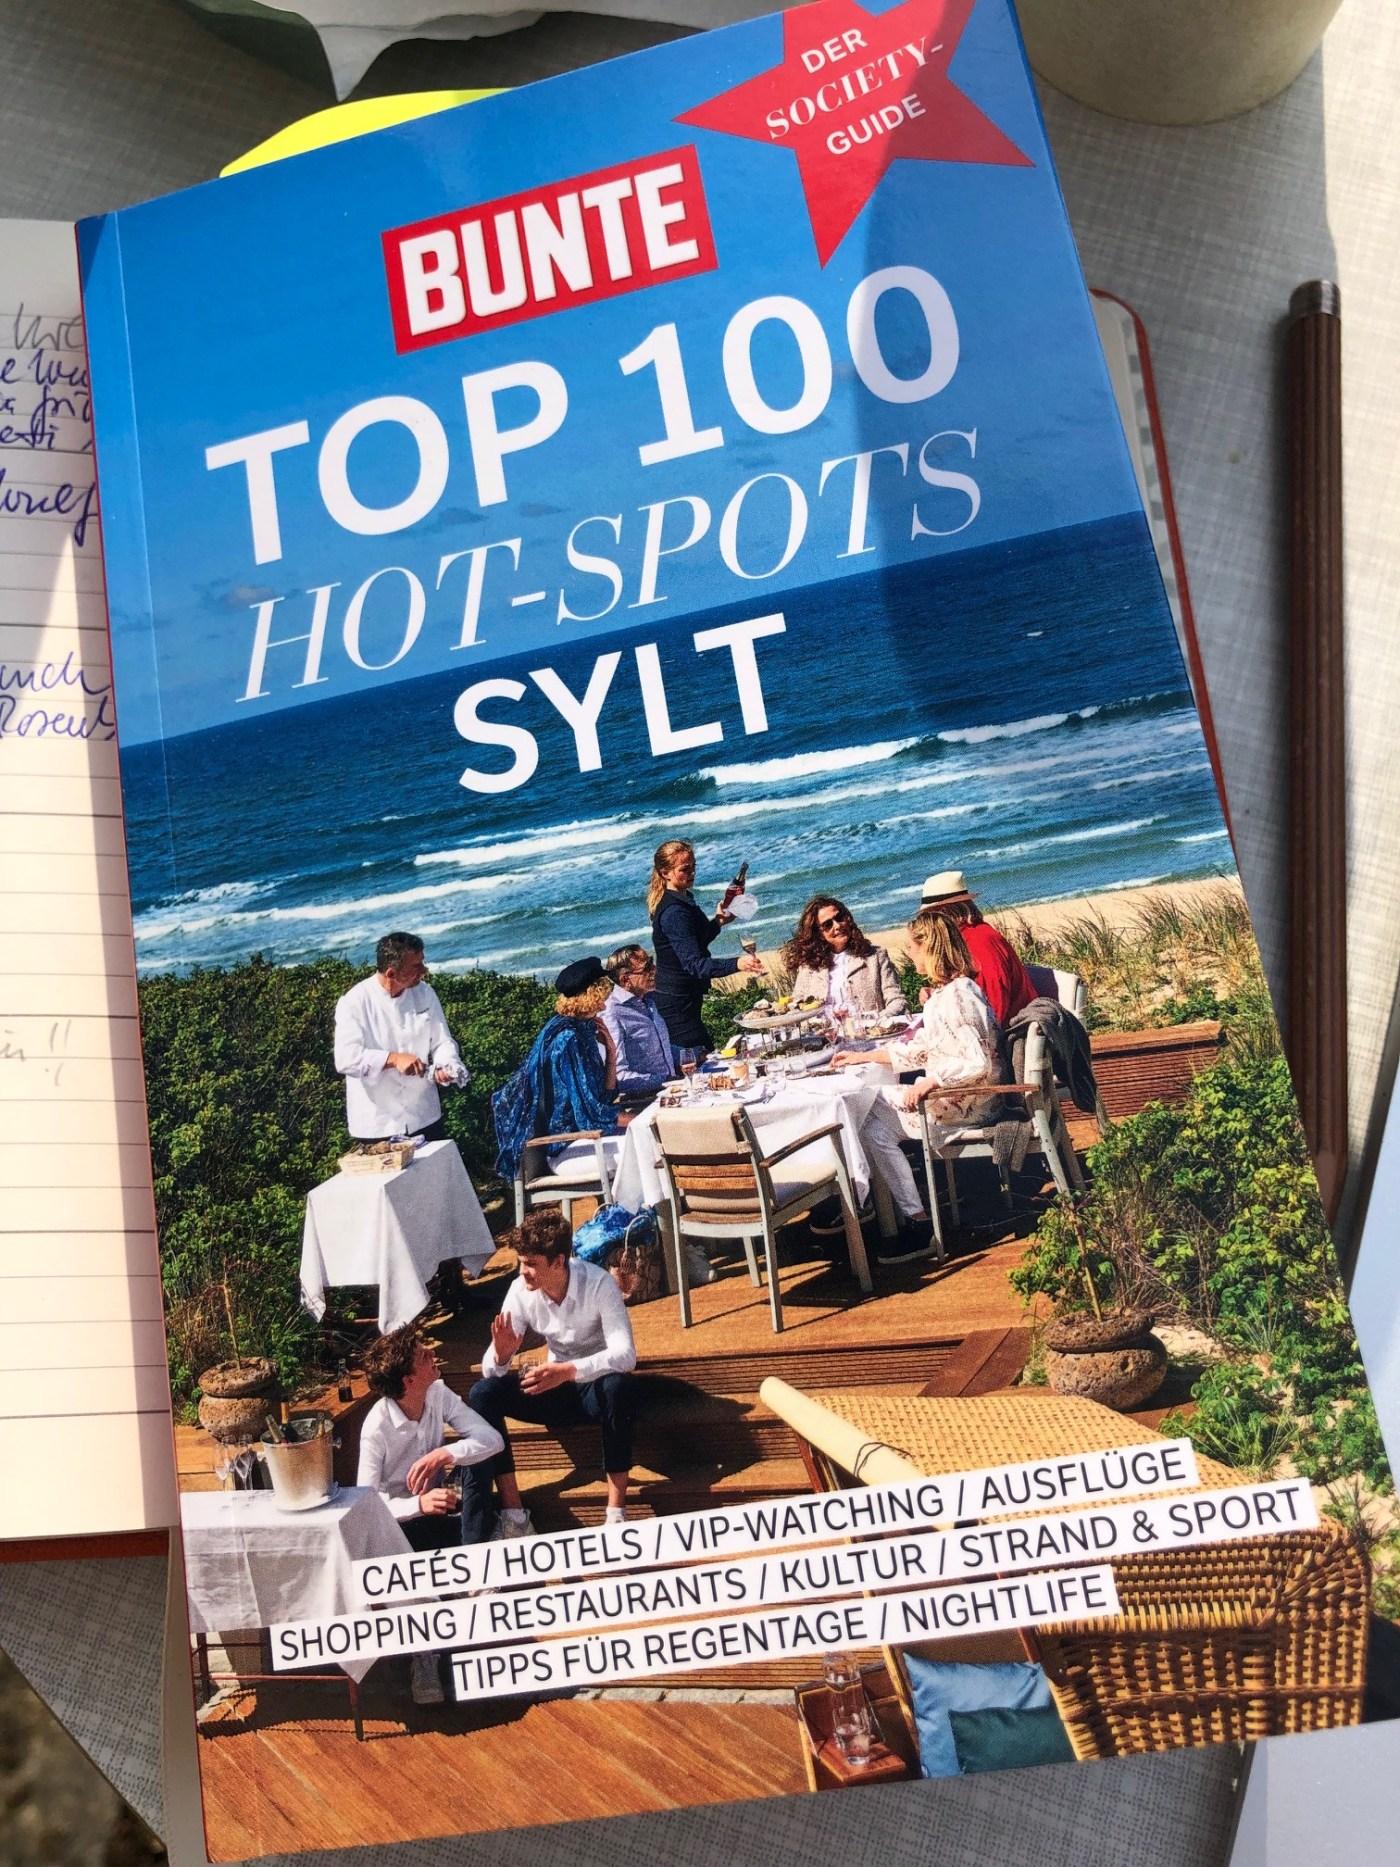 Bunte Top 100 Sylt